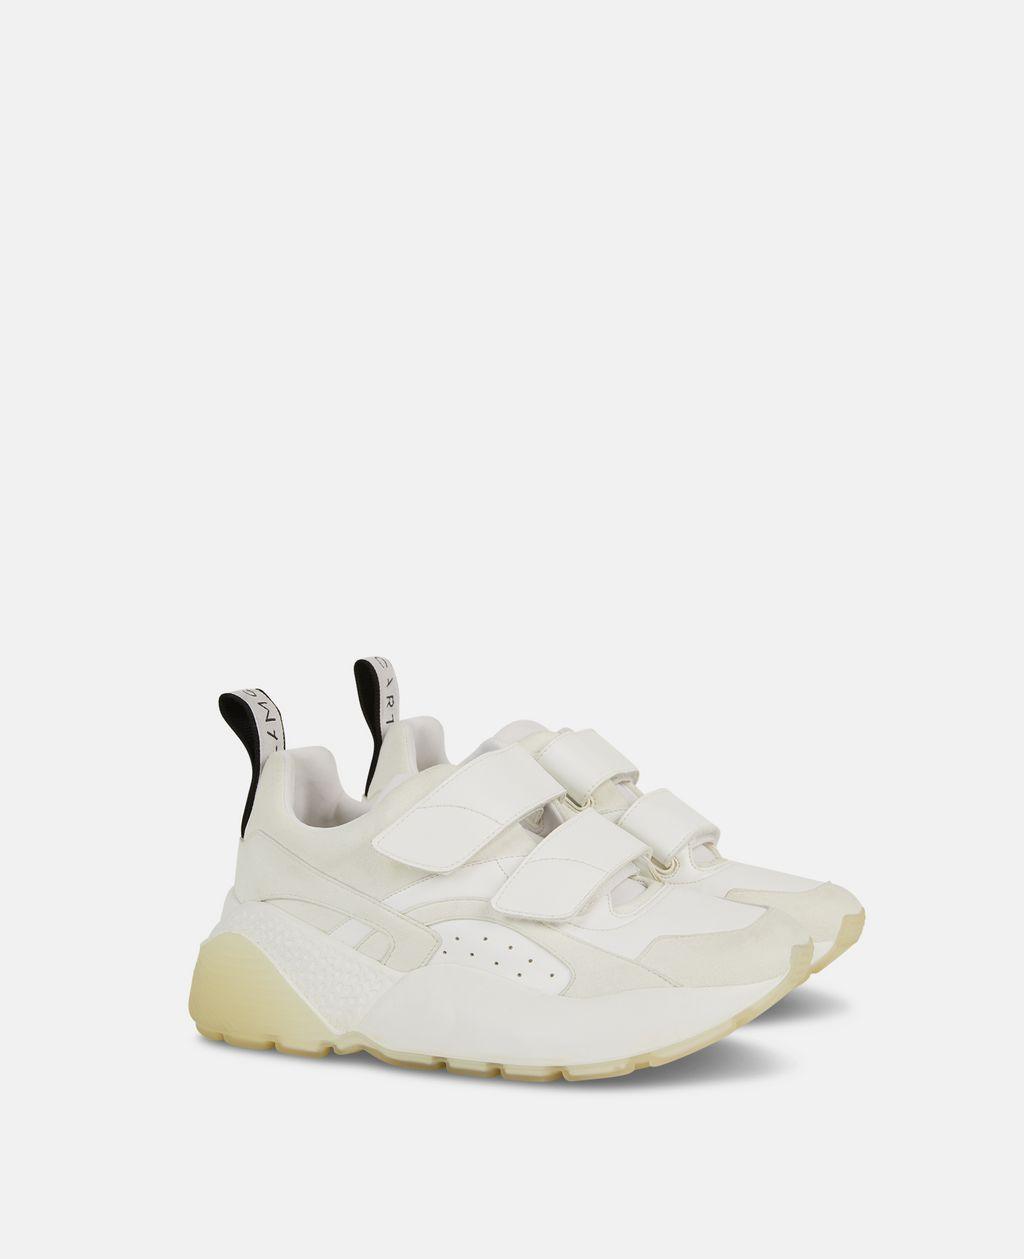 c1d62356a33219 Eclypse White Sneakers - STELLA MCCARTNEY